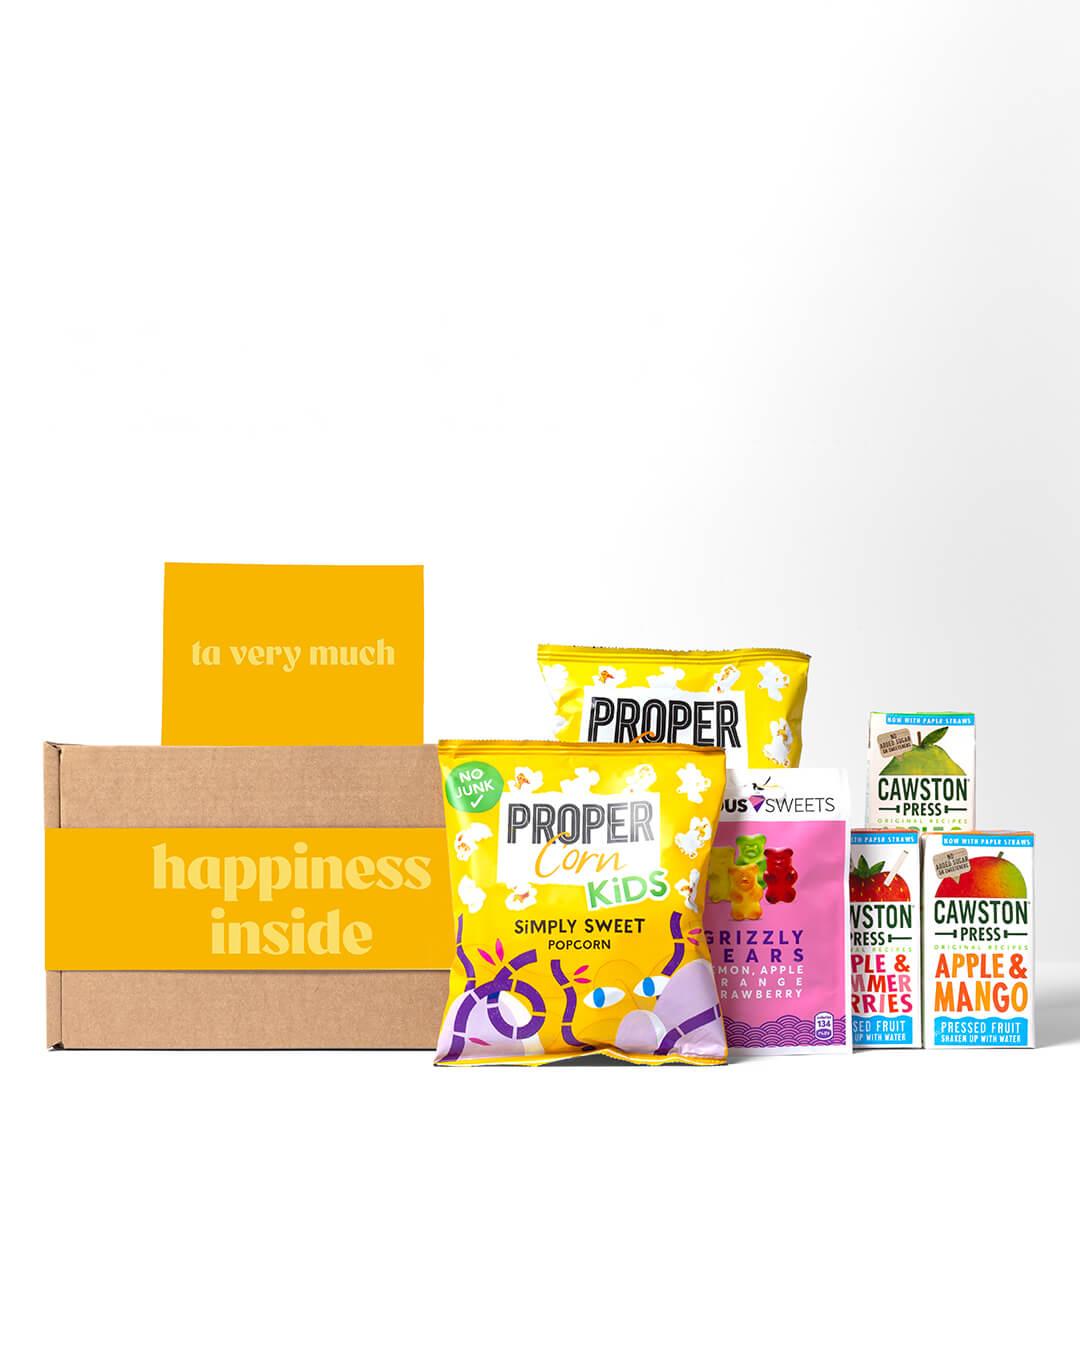 ta. soft drinks box - contents shown, Cawston juice boxes, kids Proppercorn Popcorn &  Jealous Sweets